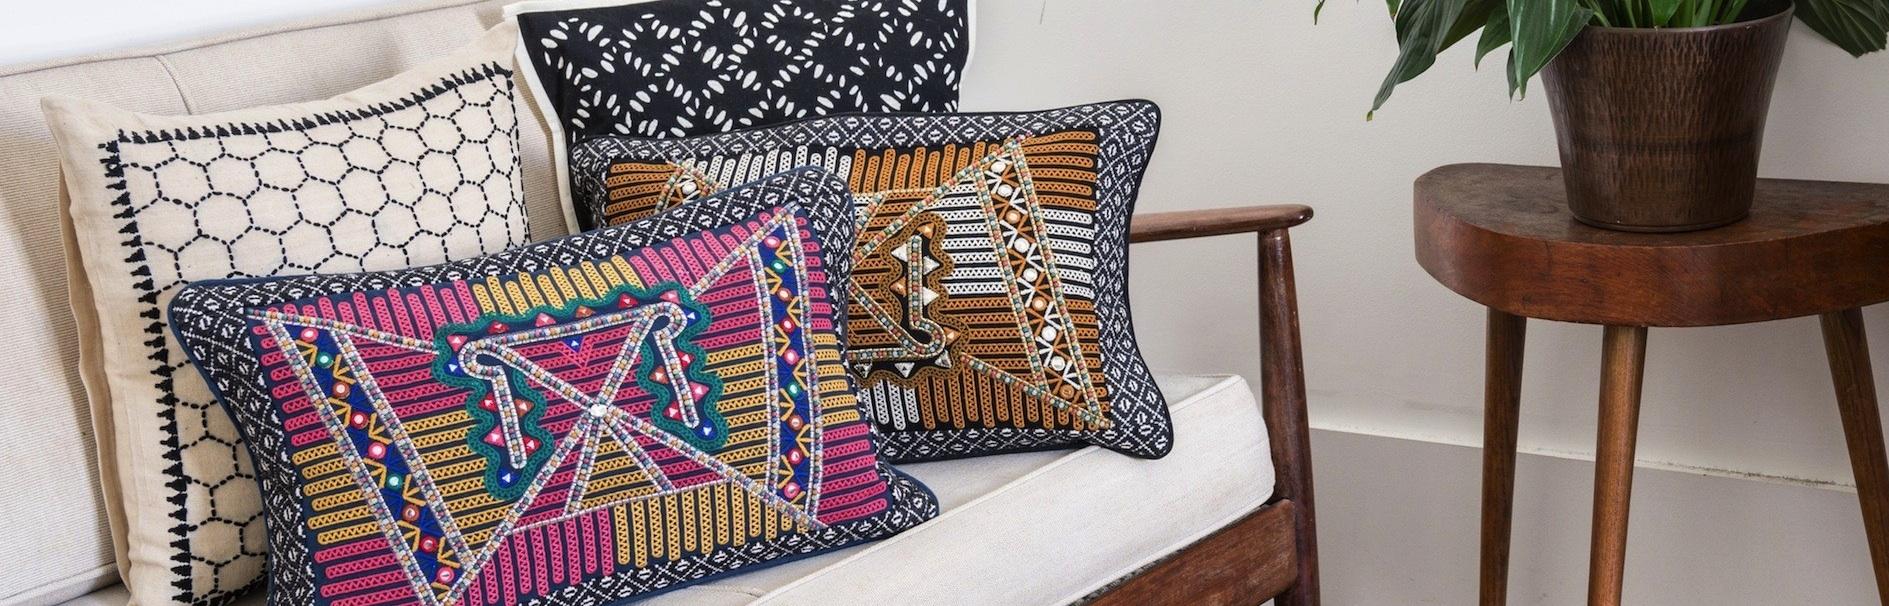 jamini sitaras cushion covers